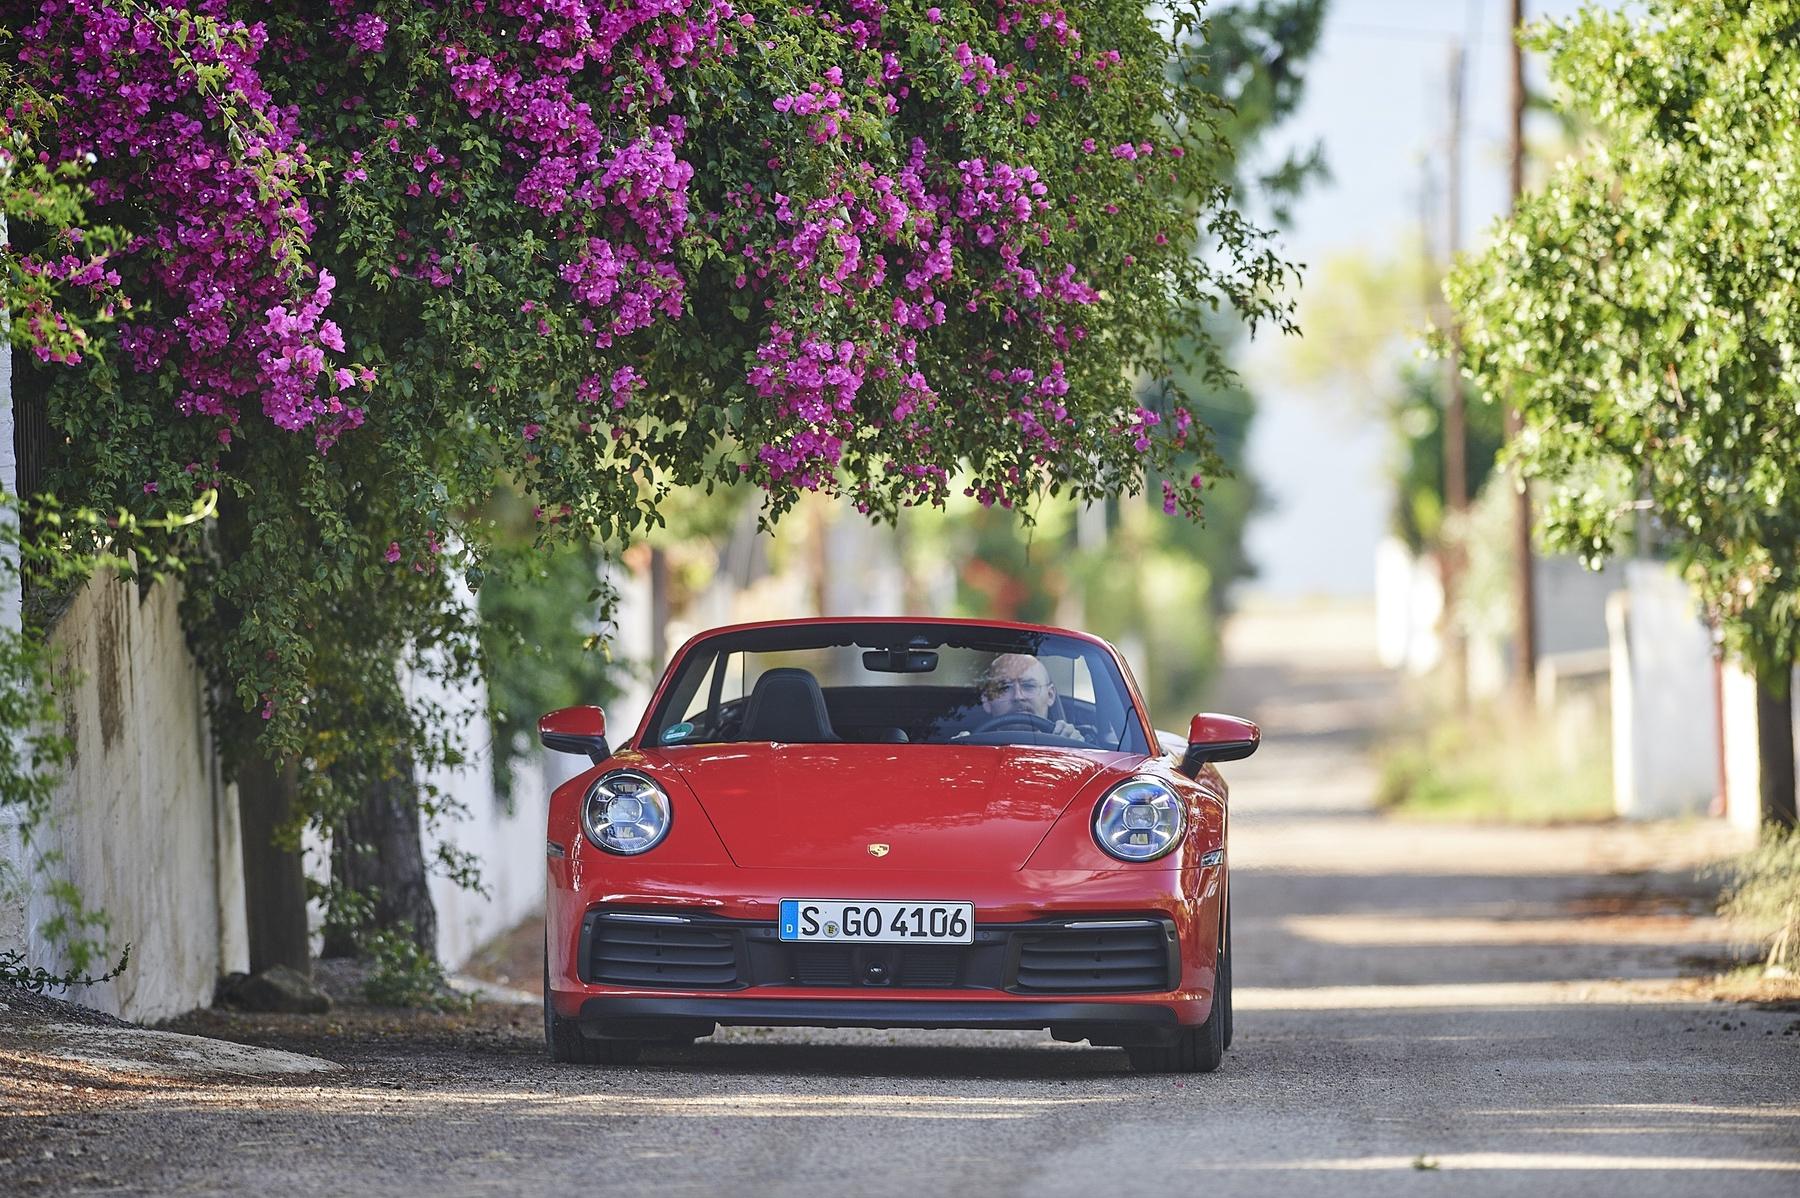 Test_Drive_Porsche_911_Athens_0120